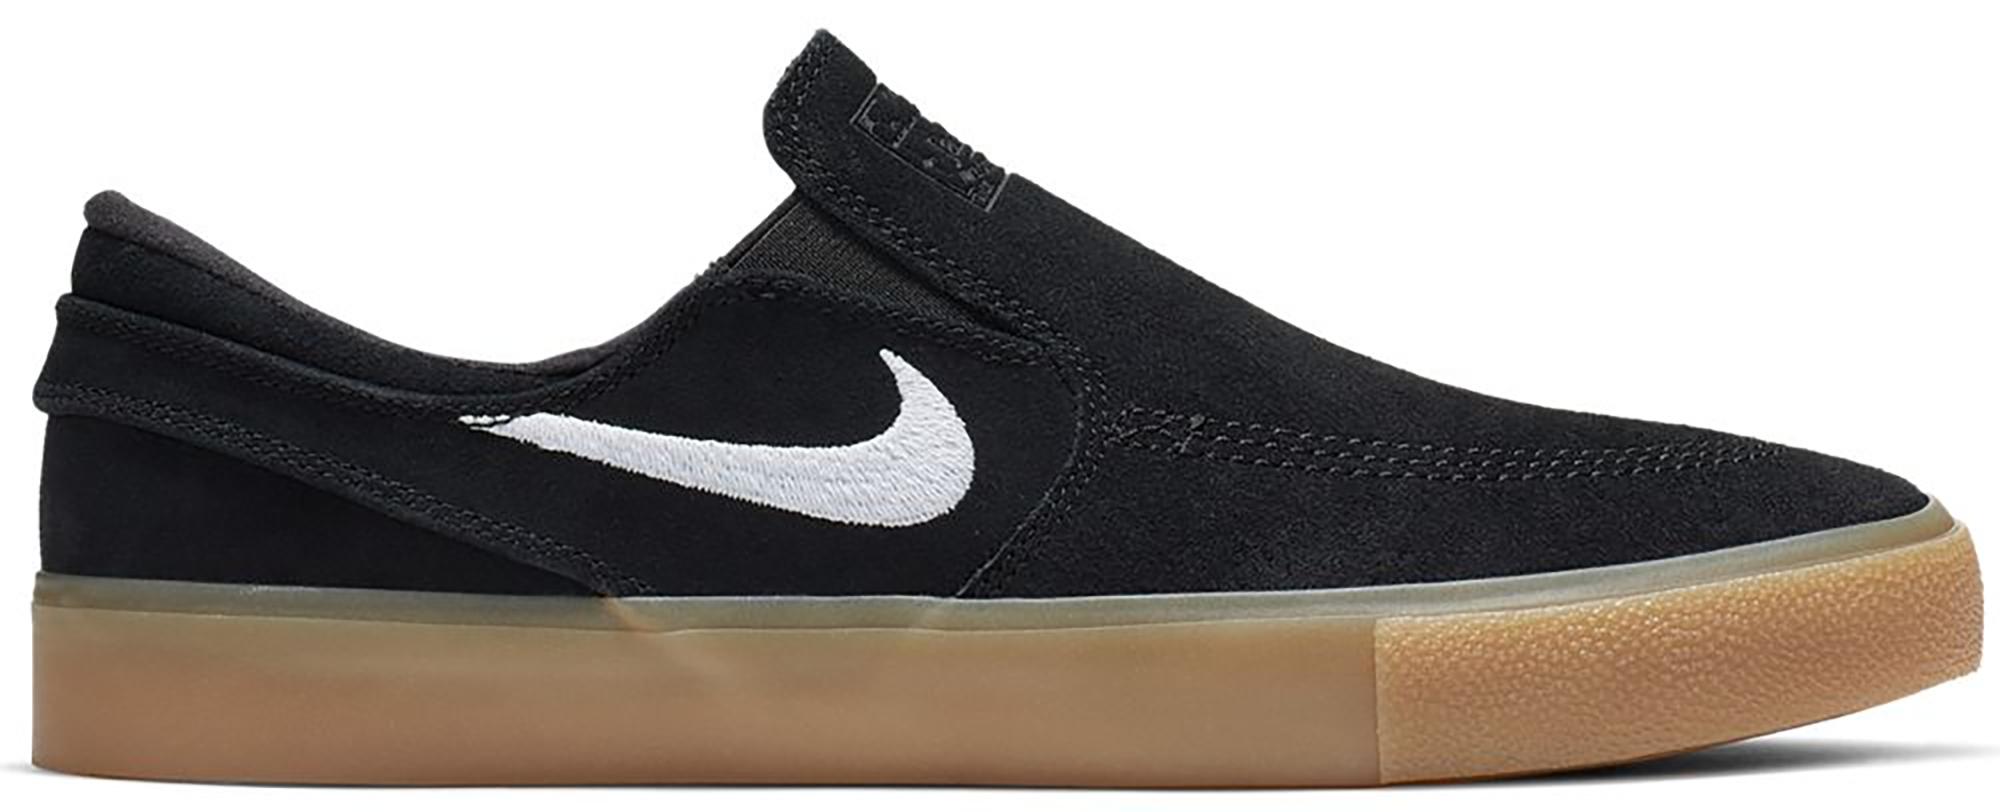 Nike SB Zoom Janoski Slip RM Black